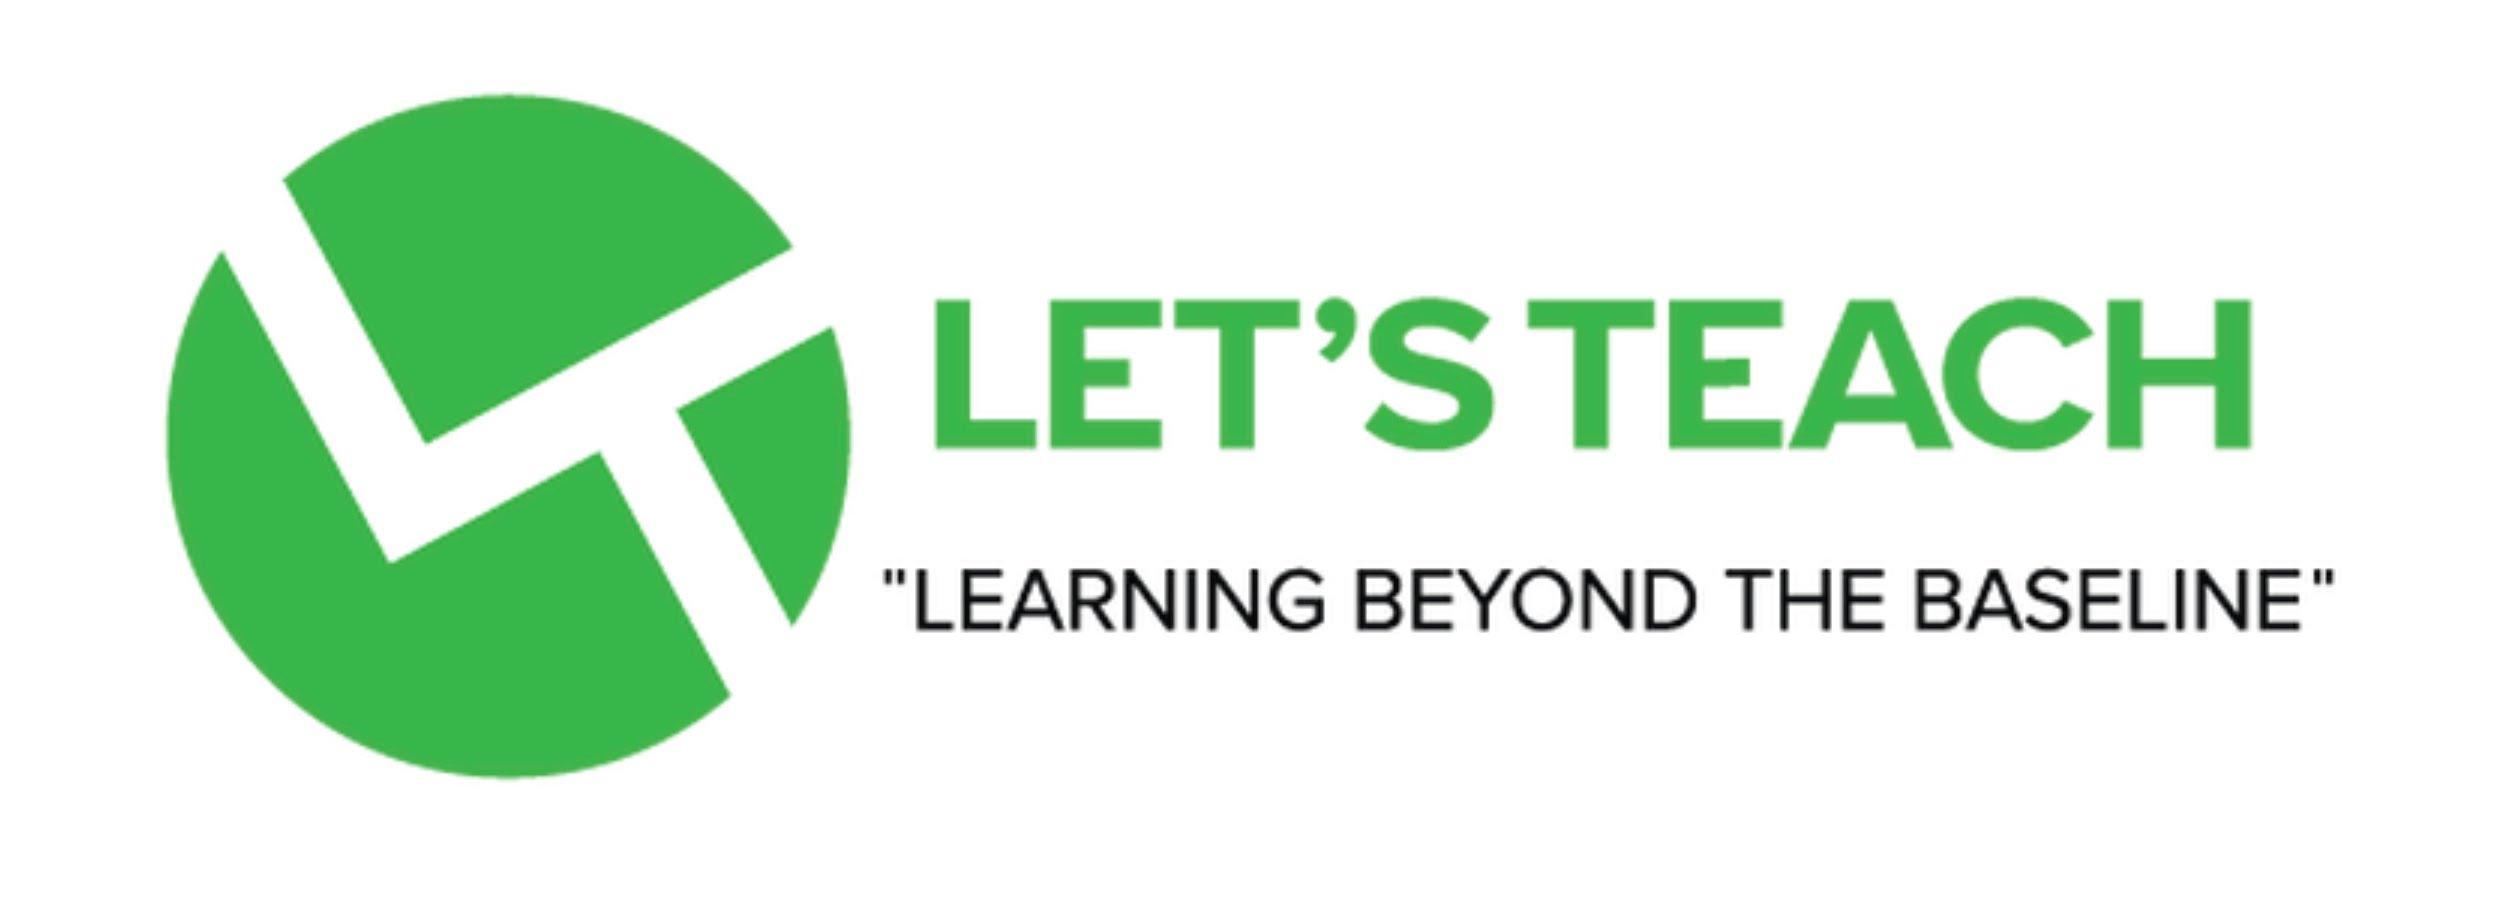 http://lets-teach.org